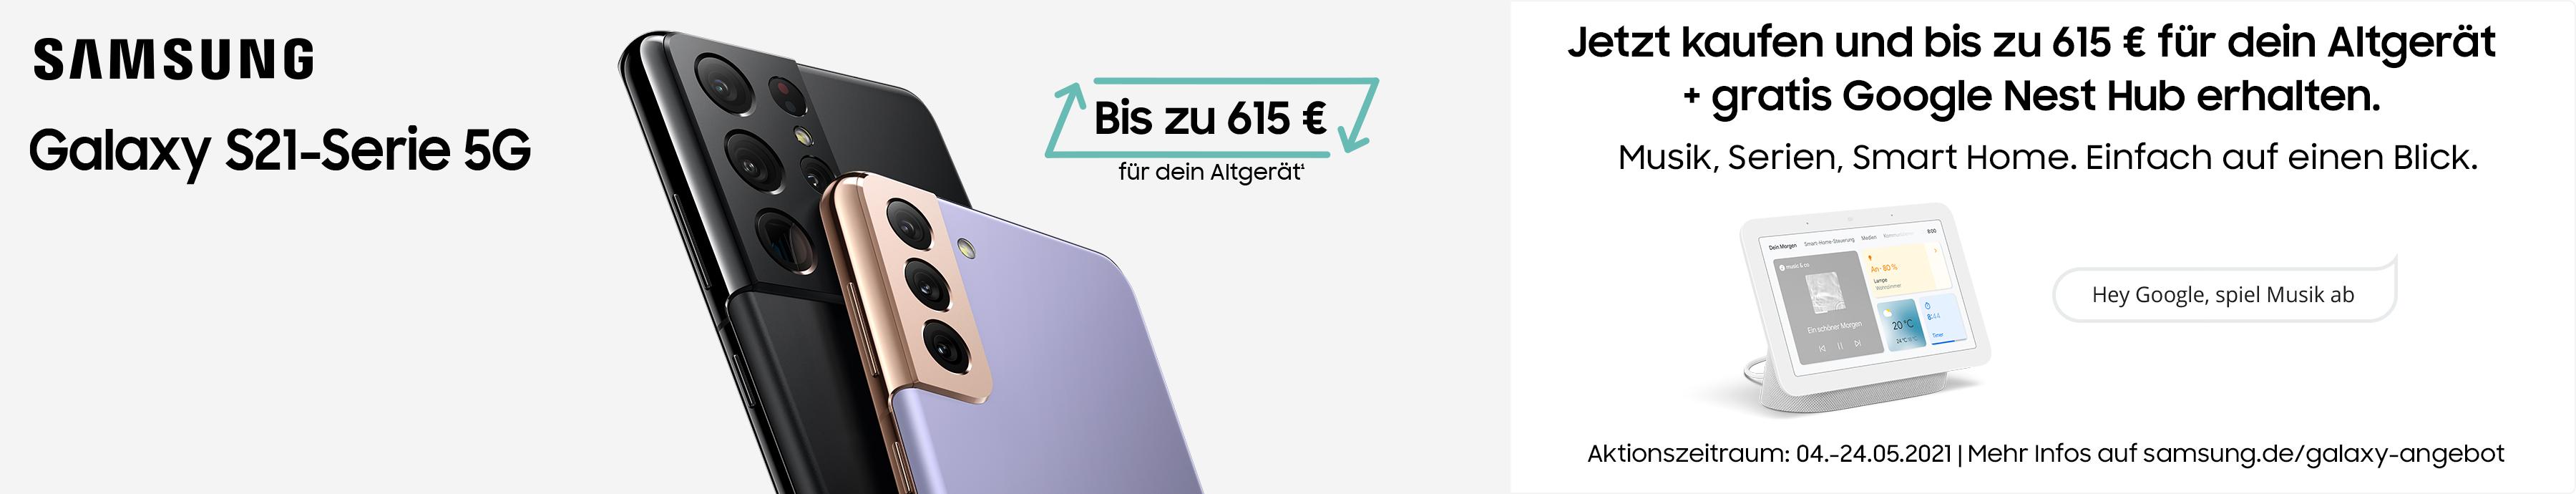 Samsung Galaxy S21 5G | S21+ 5G | S21 Ultra 5G